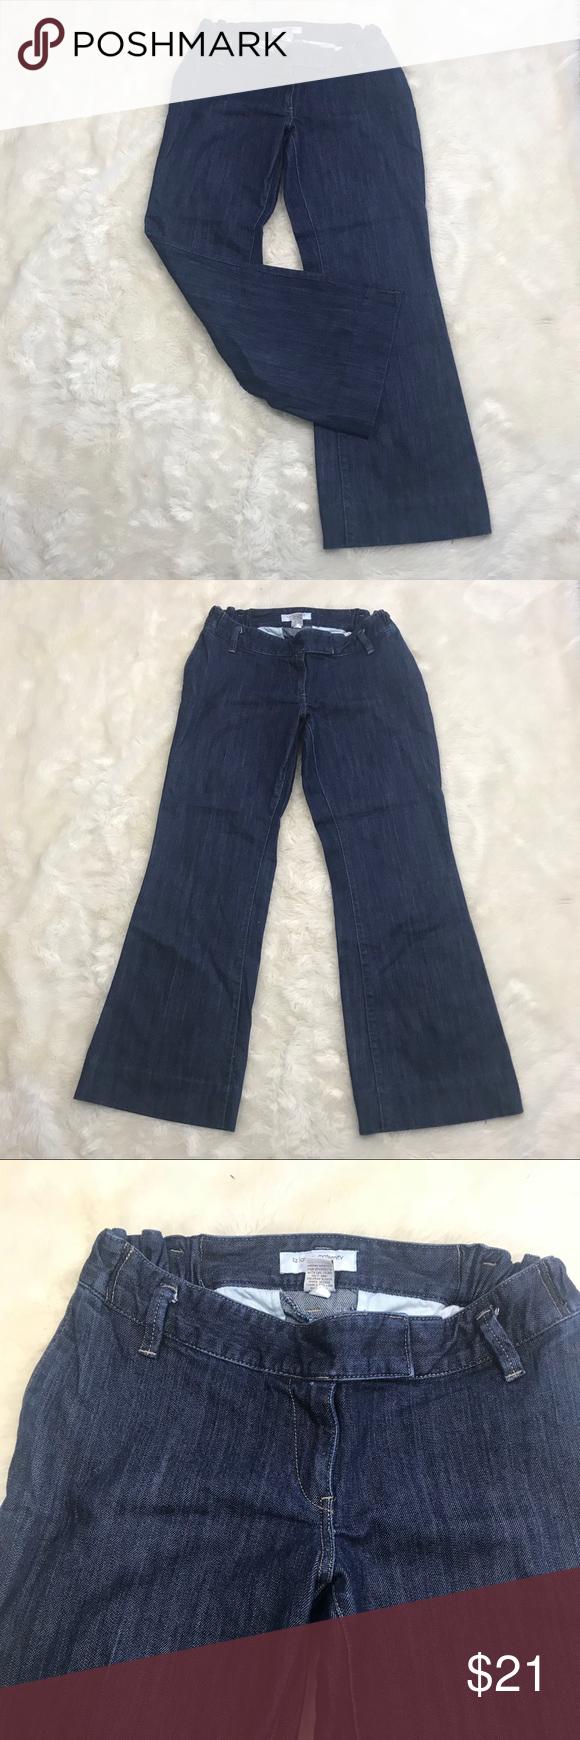 "60580519fbbc2 LIZ LANGE Maternity denim jeans Wide Leg Size 6 Liz Lange Maternity For  Target Denim Jeans Pants Size 6 Has Elastic Sides Waist 30"" Rise 8"" Length  top to ..."